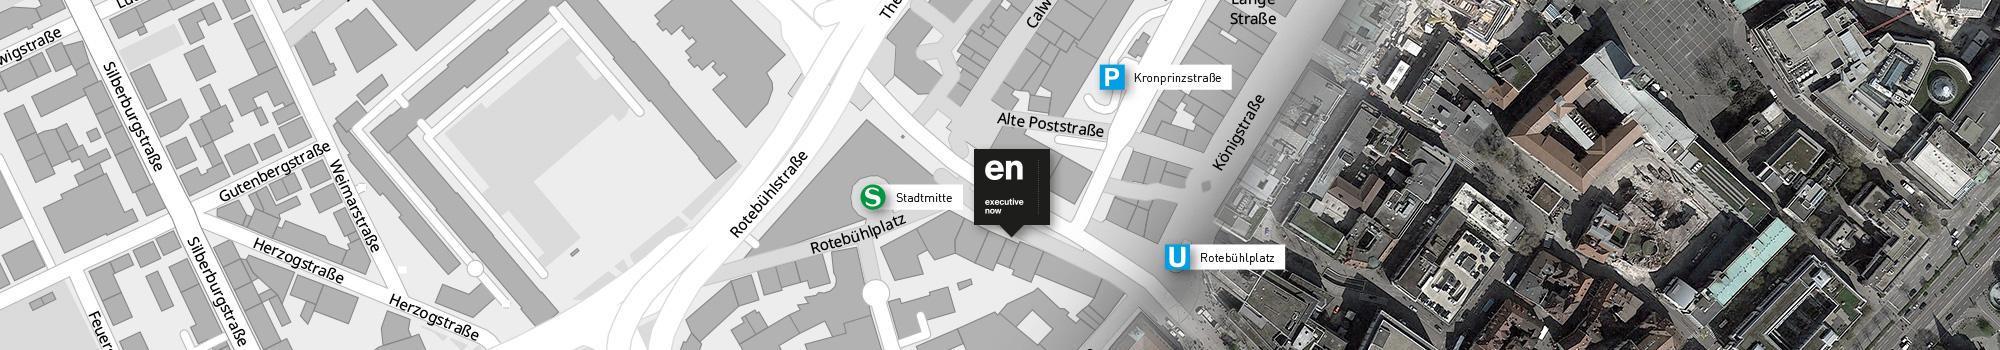 executive now - Ort, Parkhaus, U- und S-Bahn